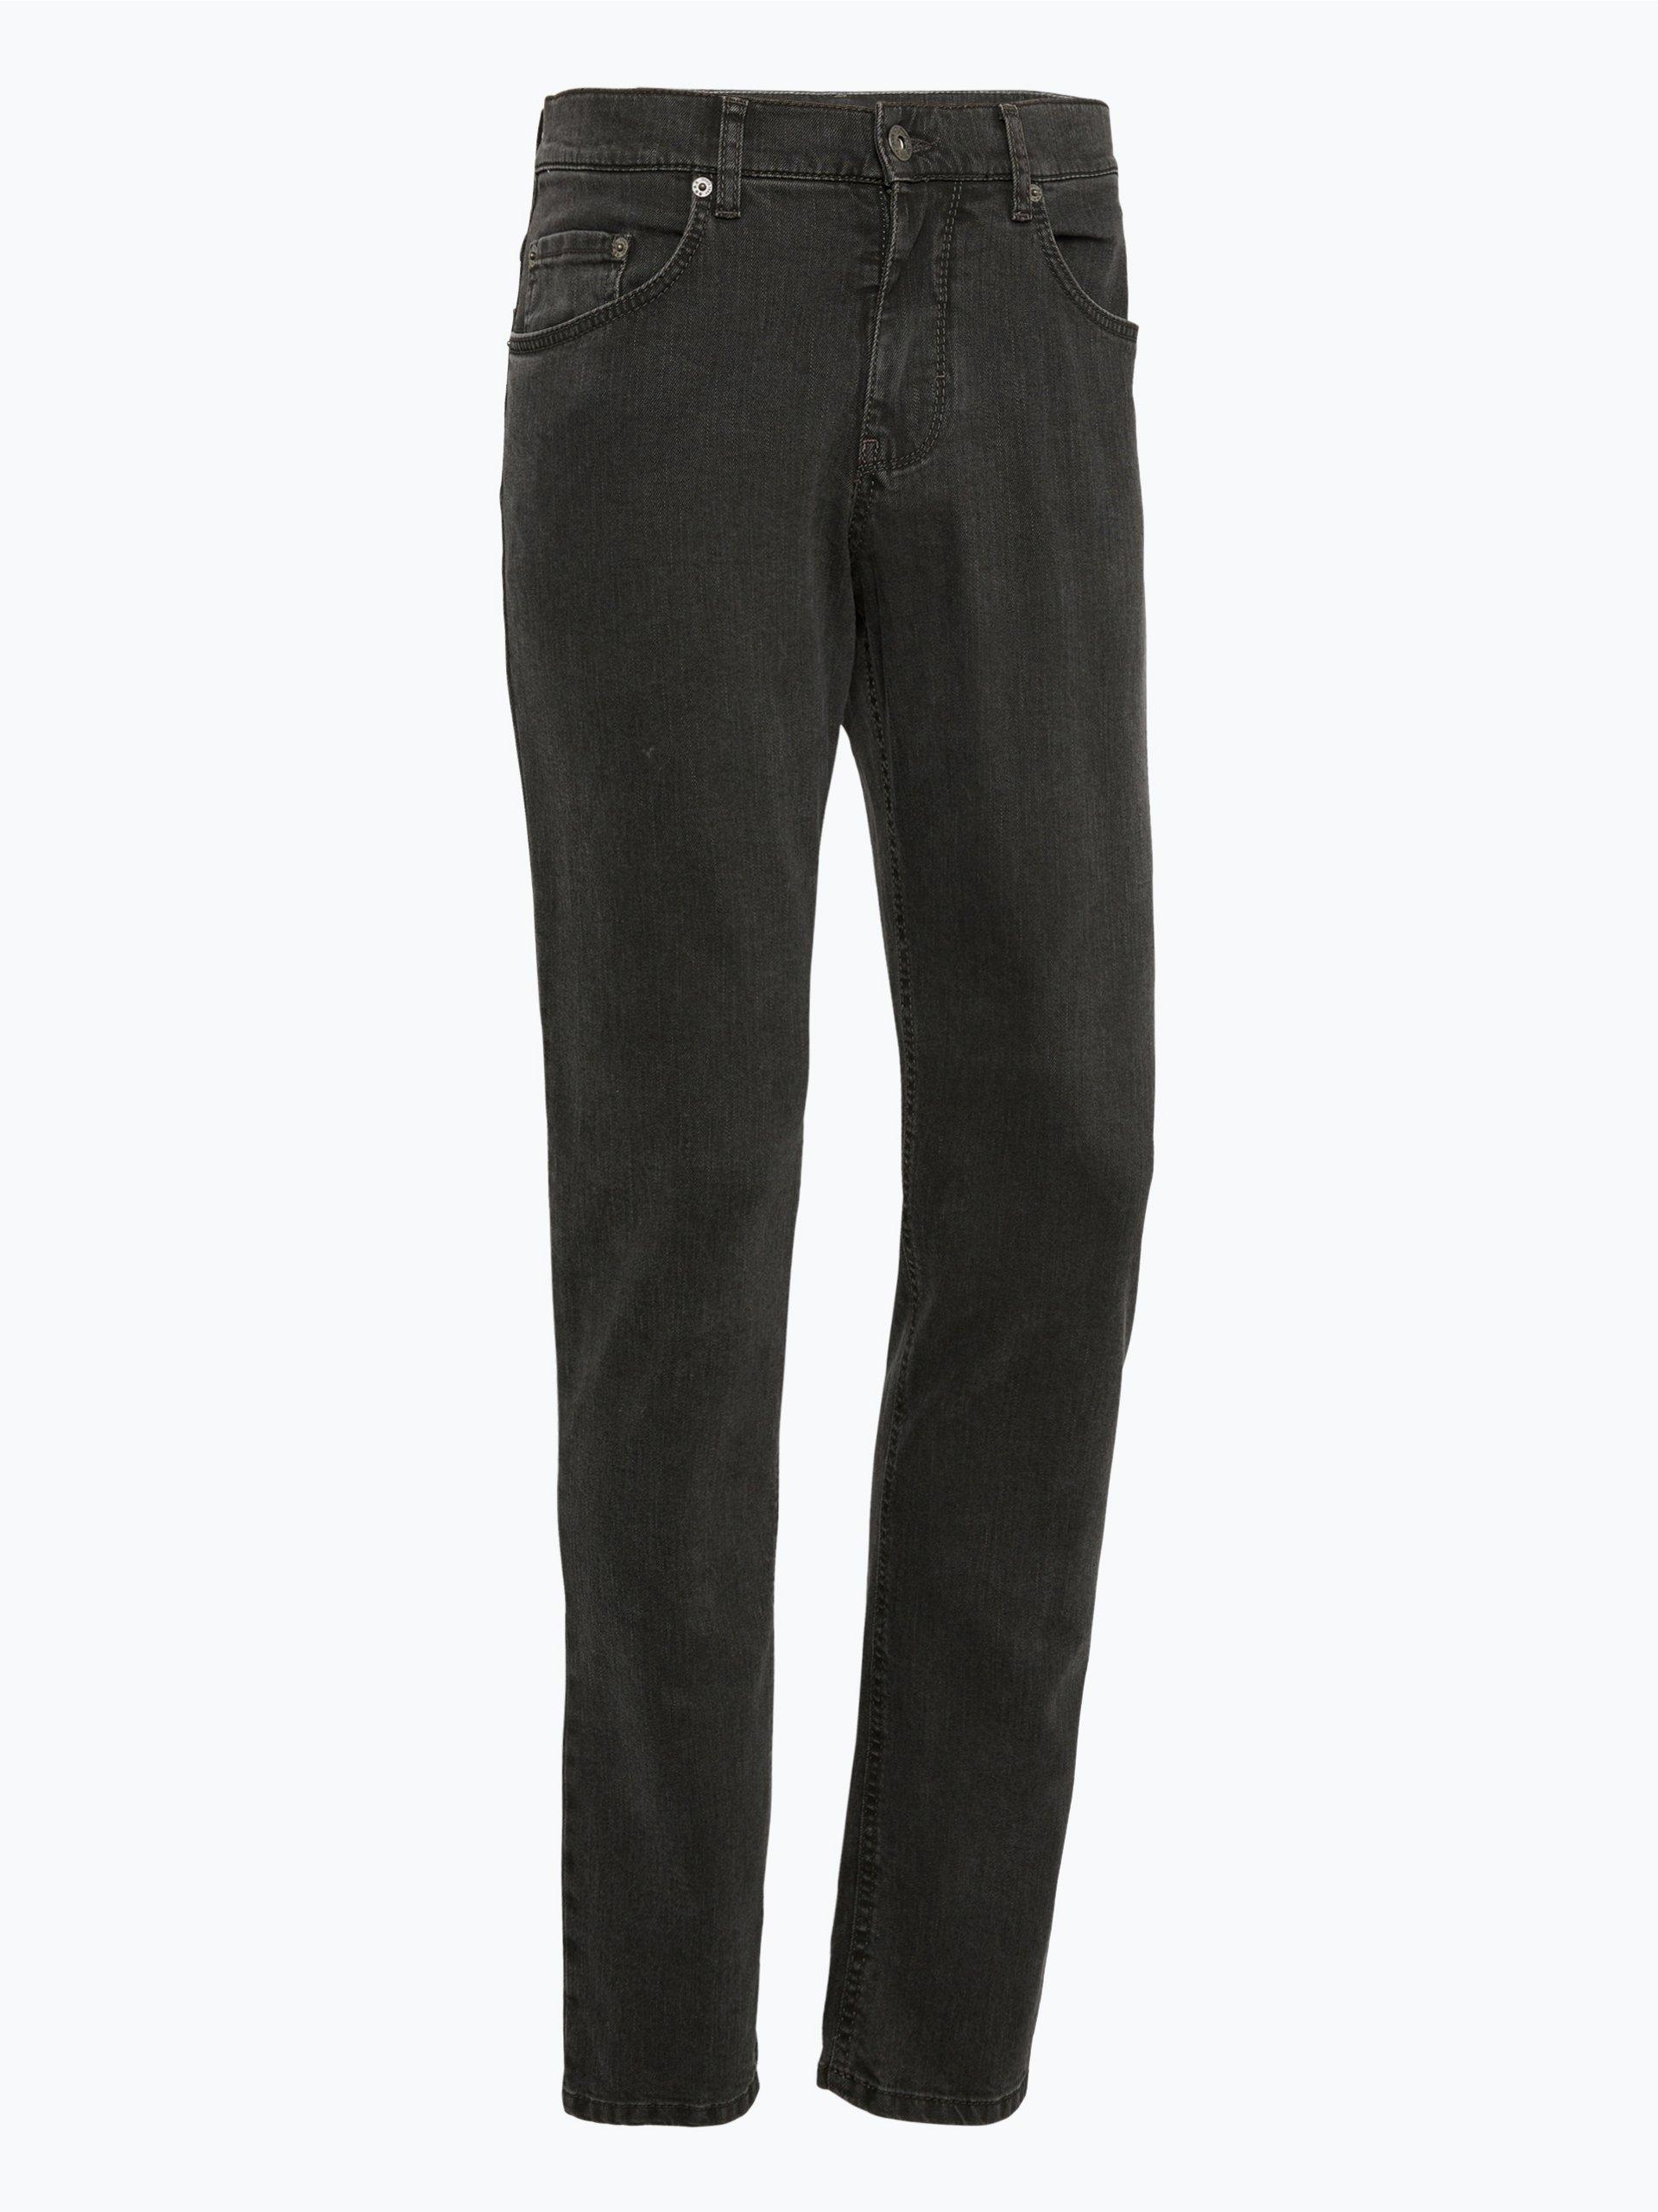 brax herren jeans cooper anthrazit uni online kaufen. Black Bedroom Furniture Sets. Home Design Ideas